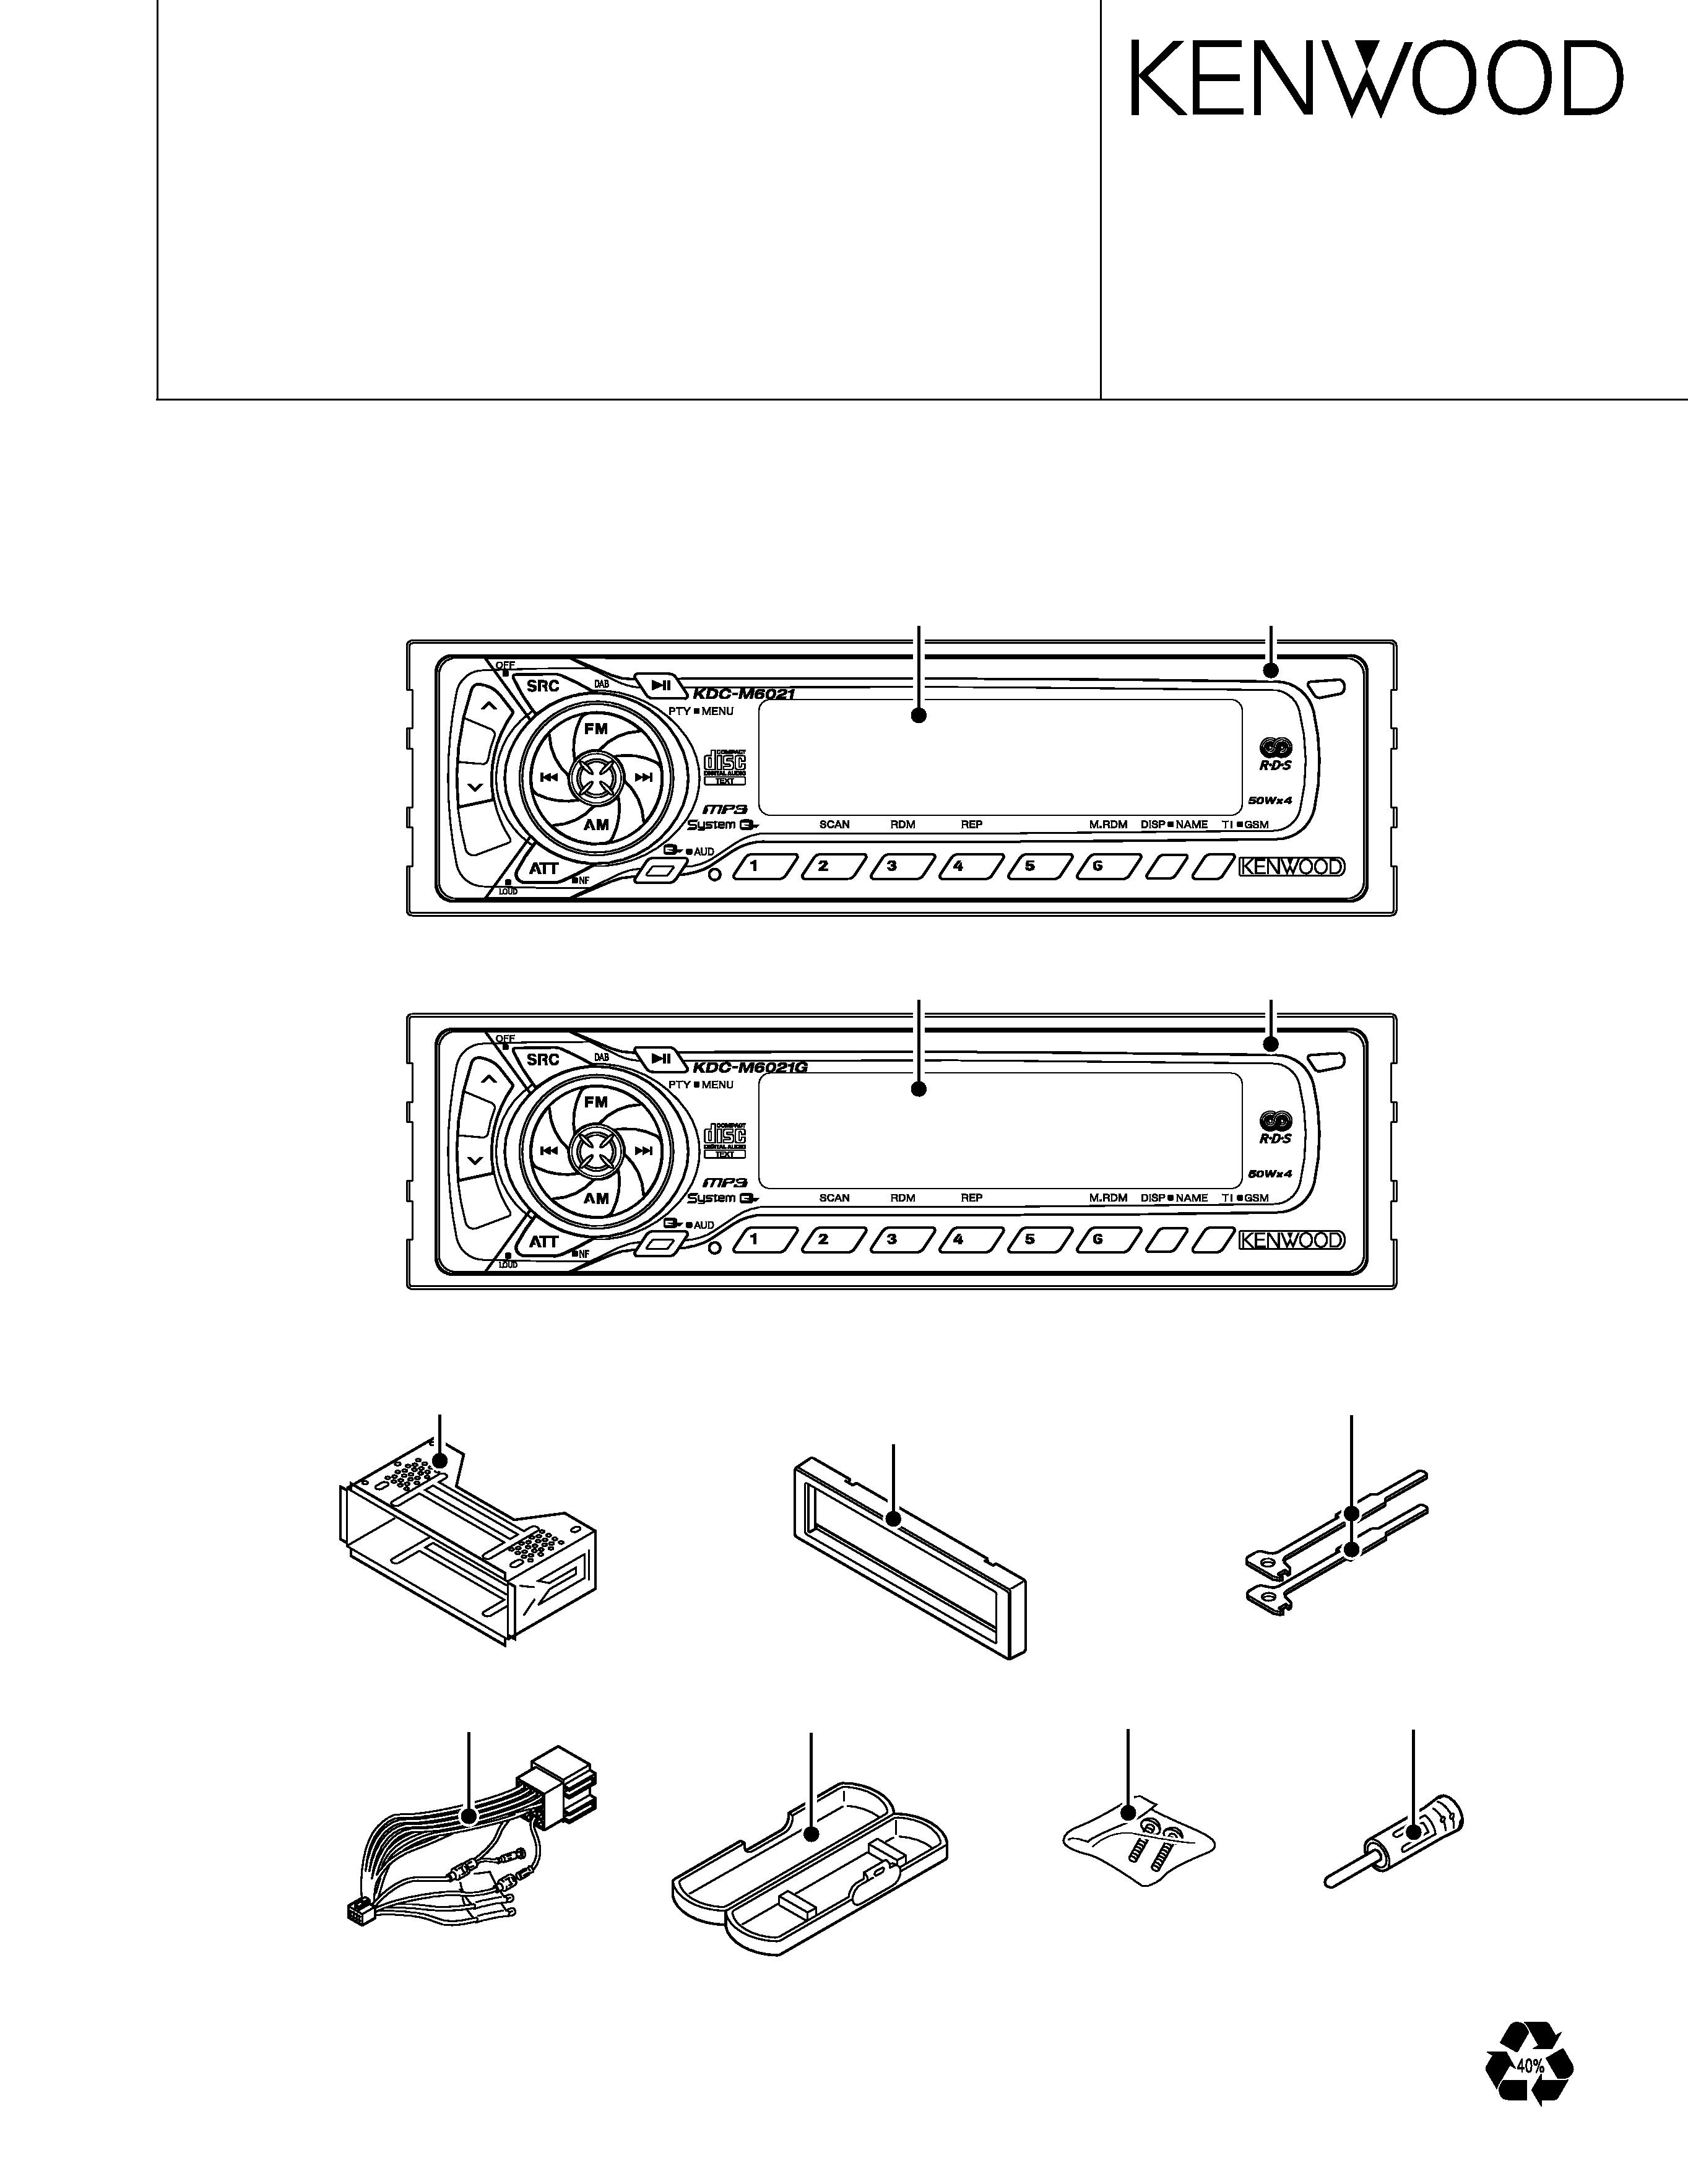 Service Manual For Kenwood Kdc-m6021g